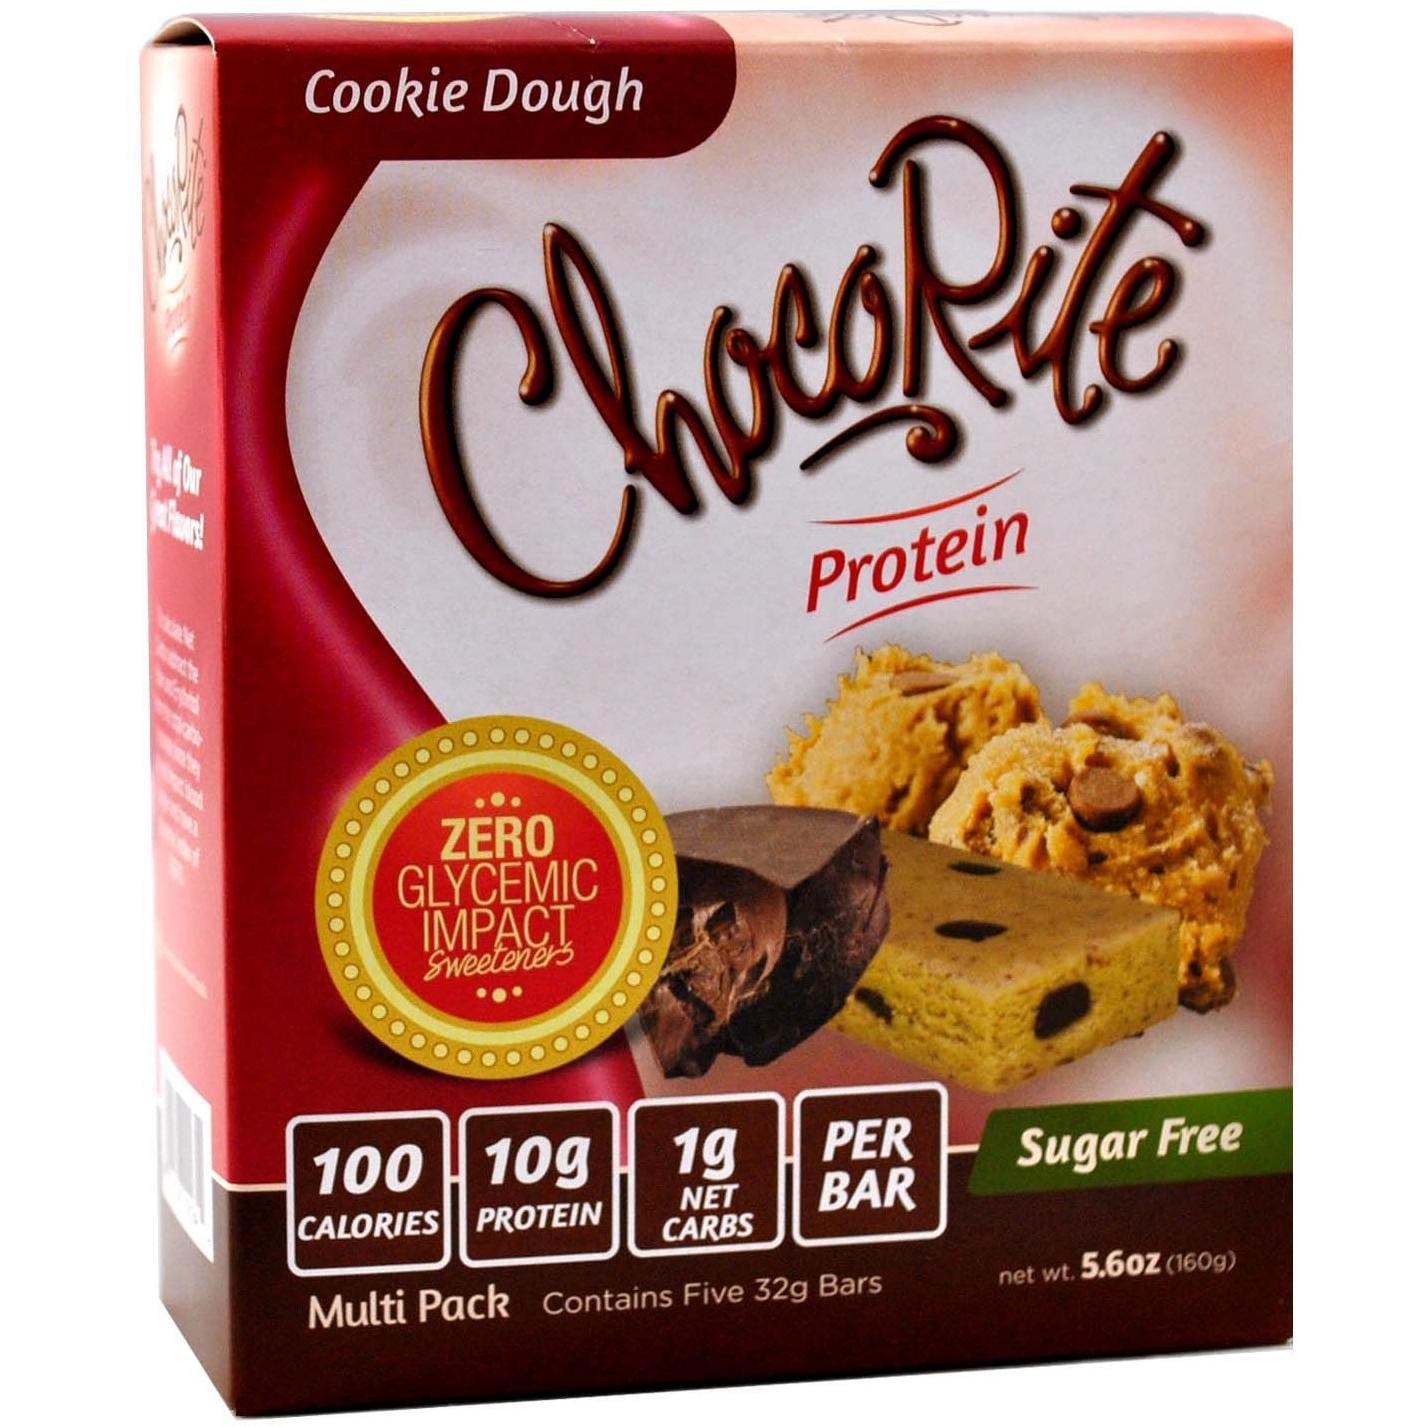 CHOCORITE High Protein Diet Bar  Cookie Dough  Sugar Free, Low Calorie, Cholesterol Free by Chocorite